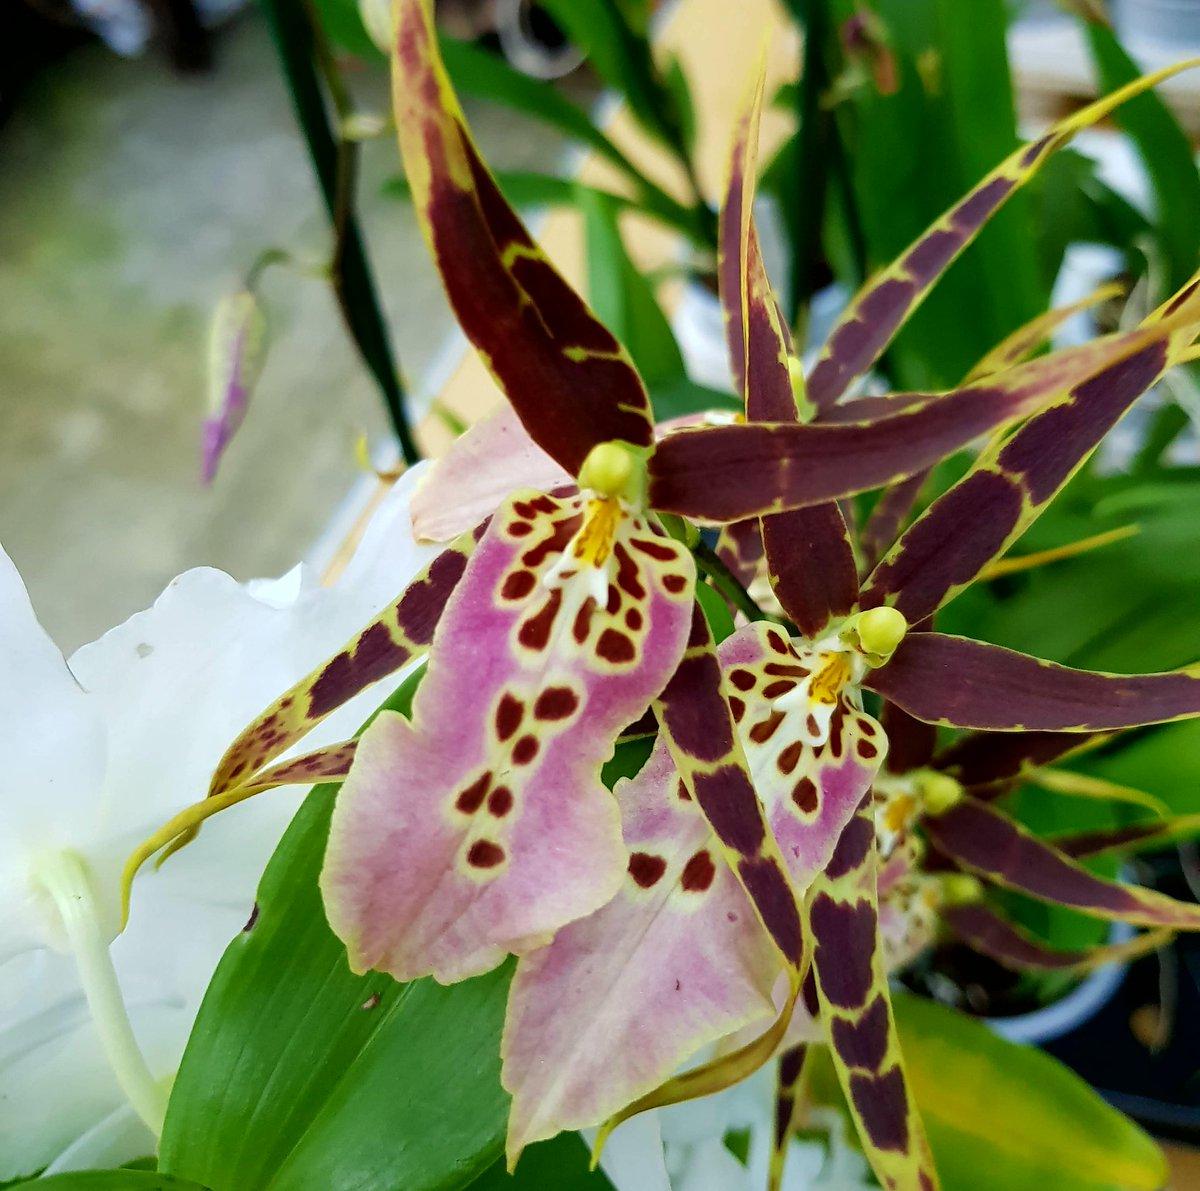 #Brassia Tolkien #Orchid <br>http://pic.twitter.com/1CV6eVvfmh